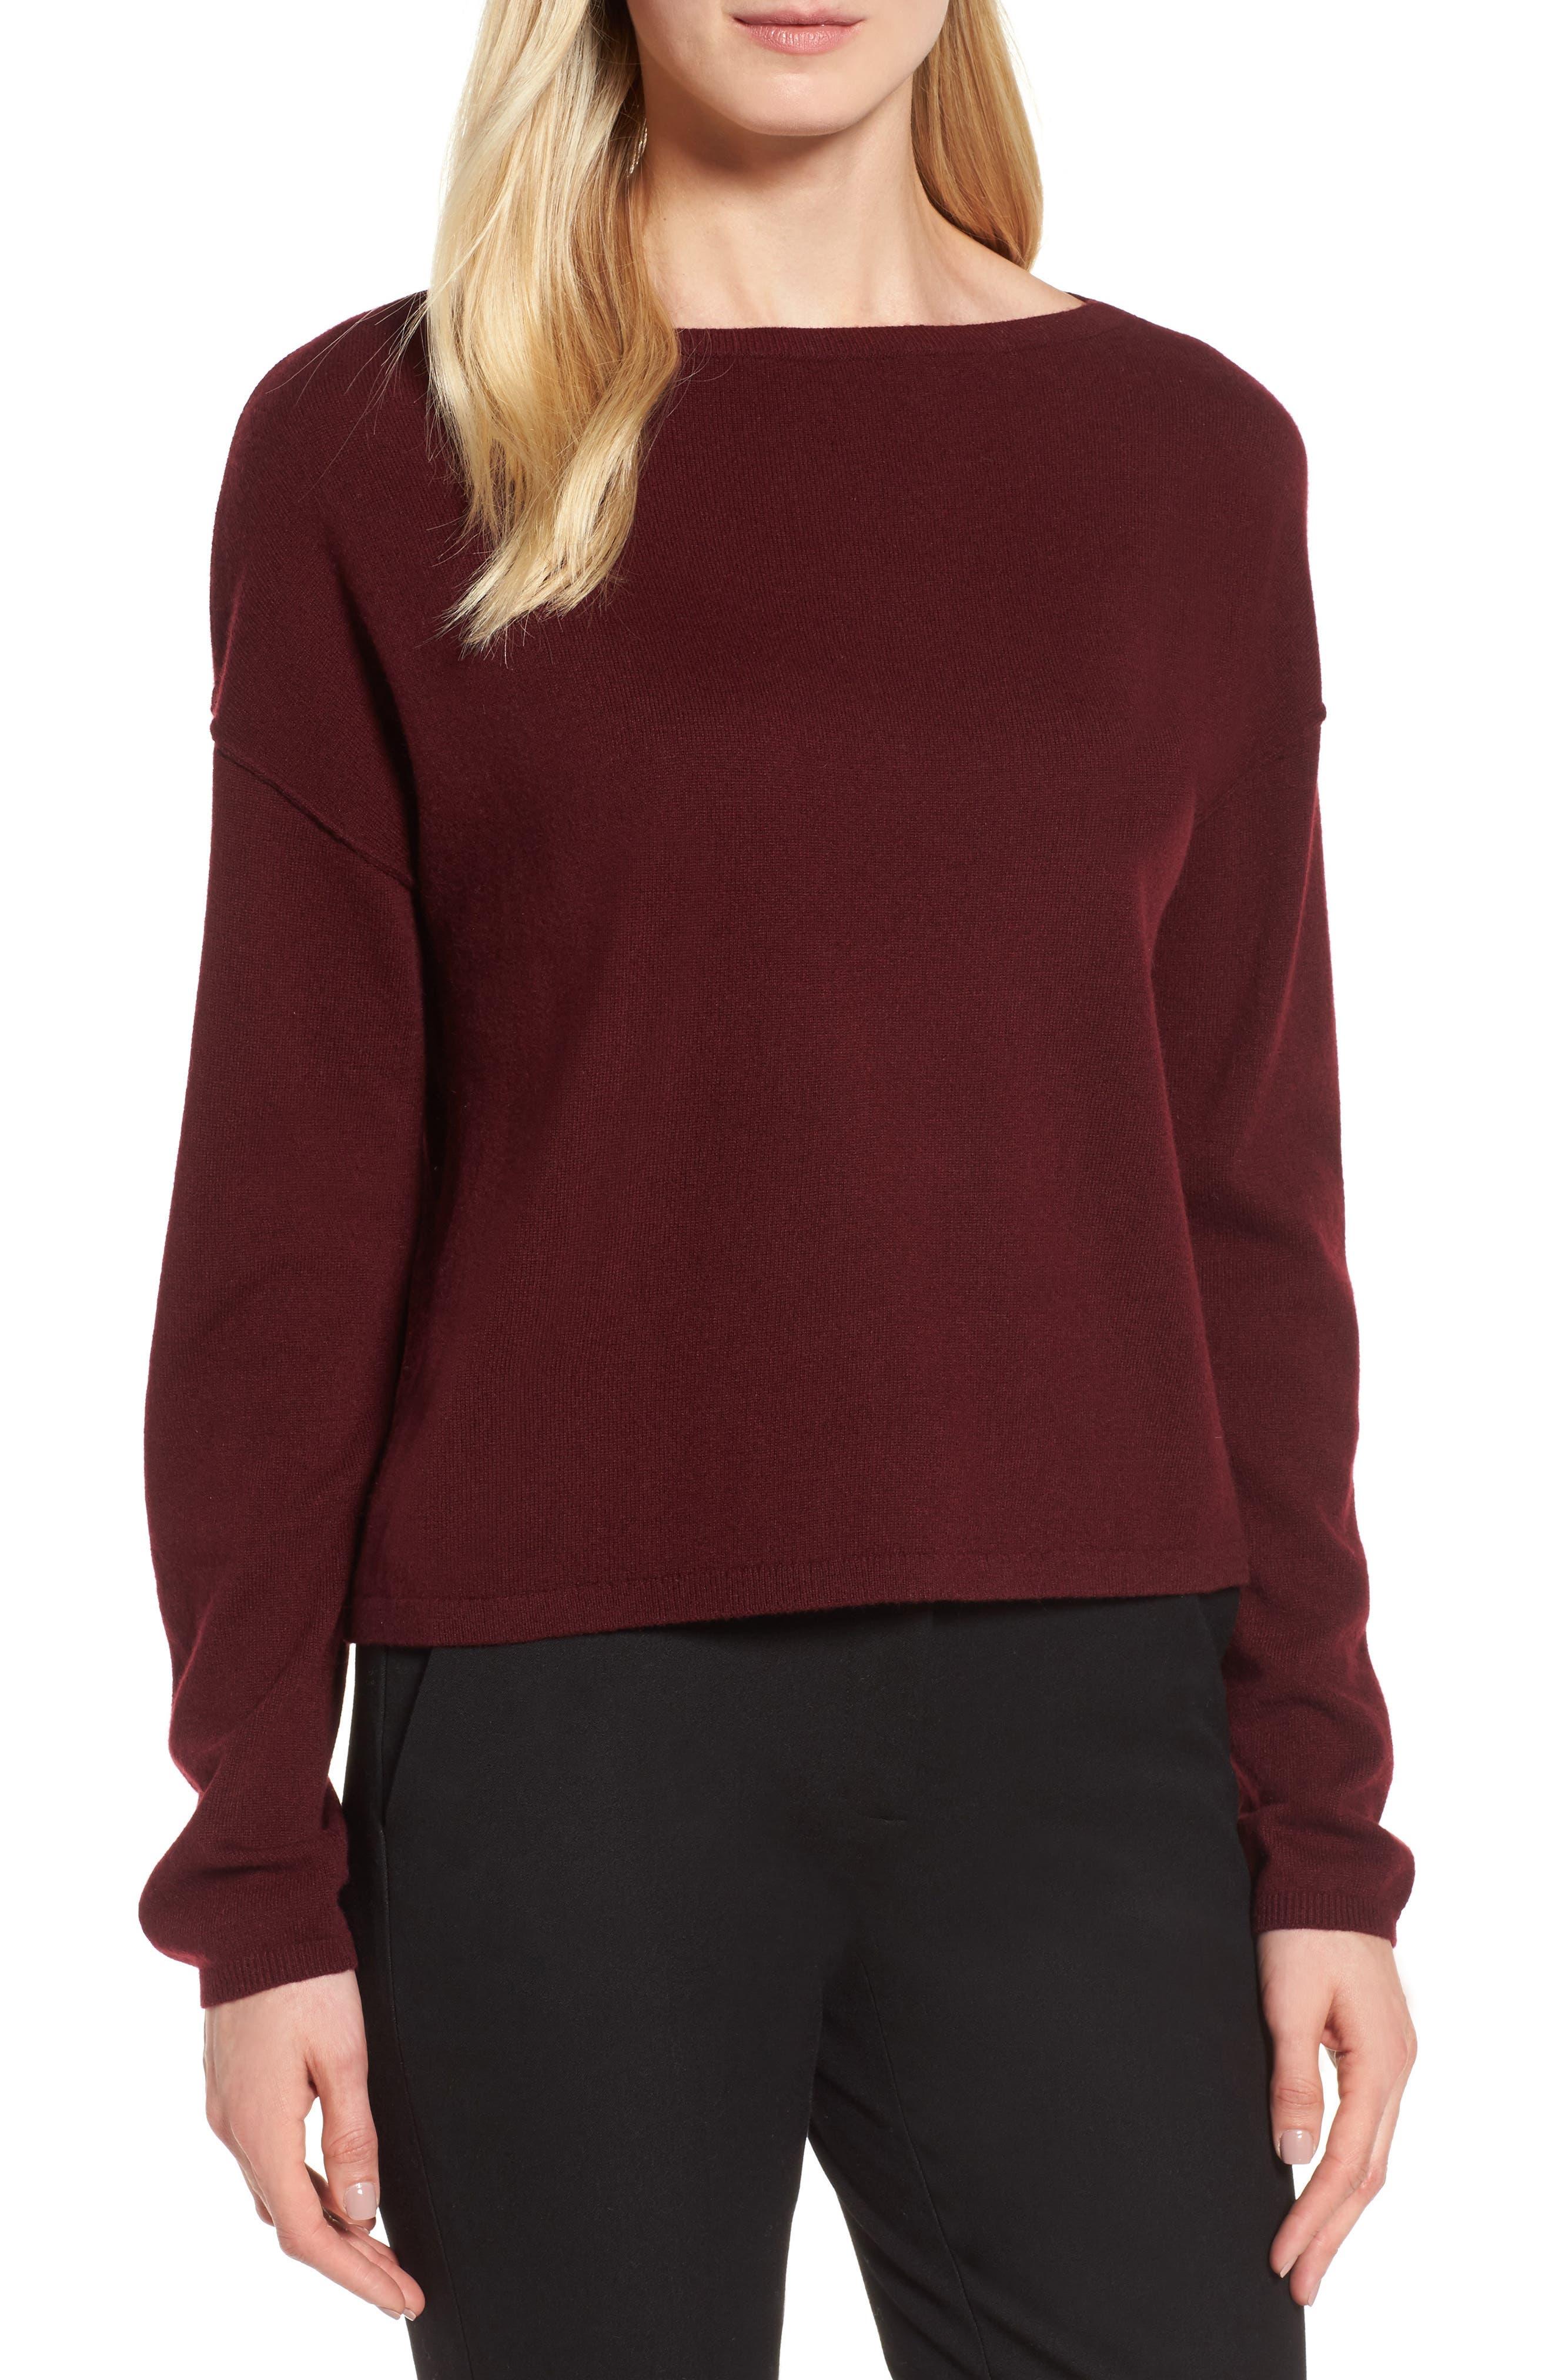 Nordstrom Signature Bateau Neck Cashmere Sweater